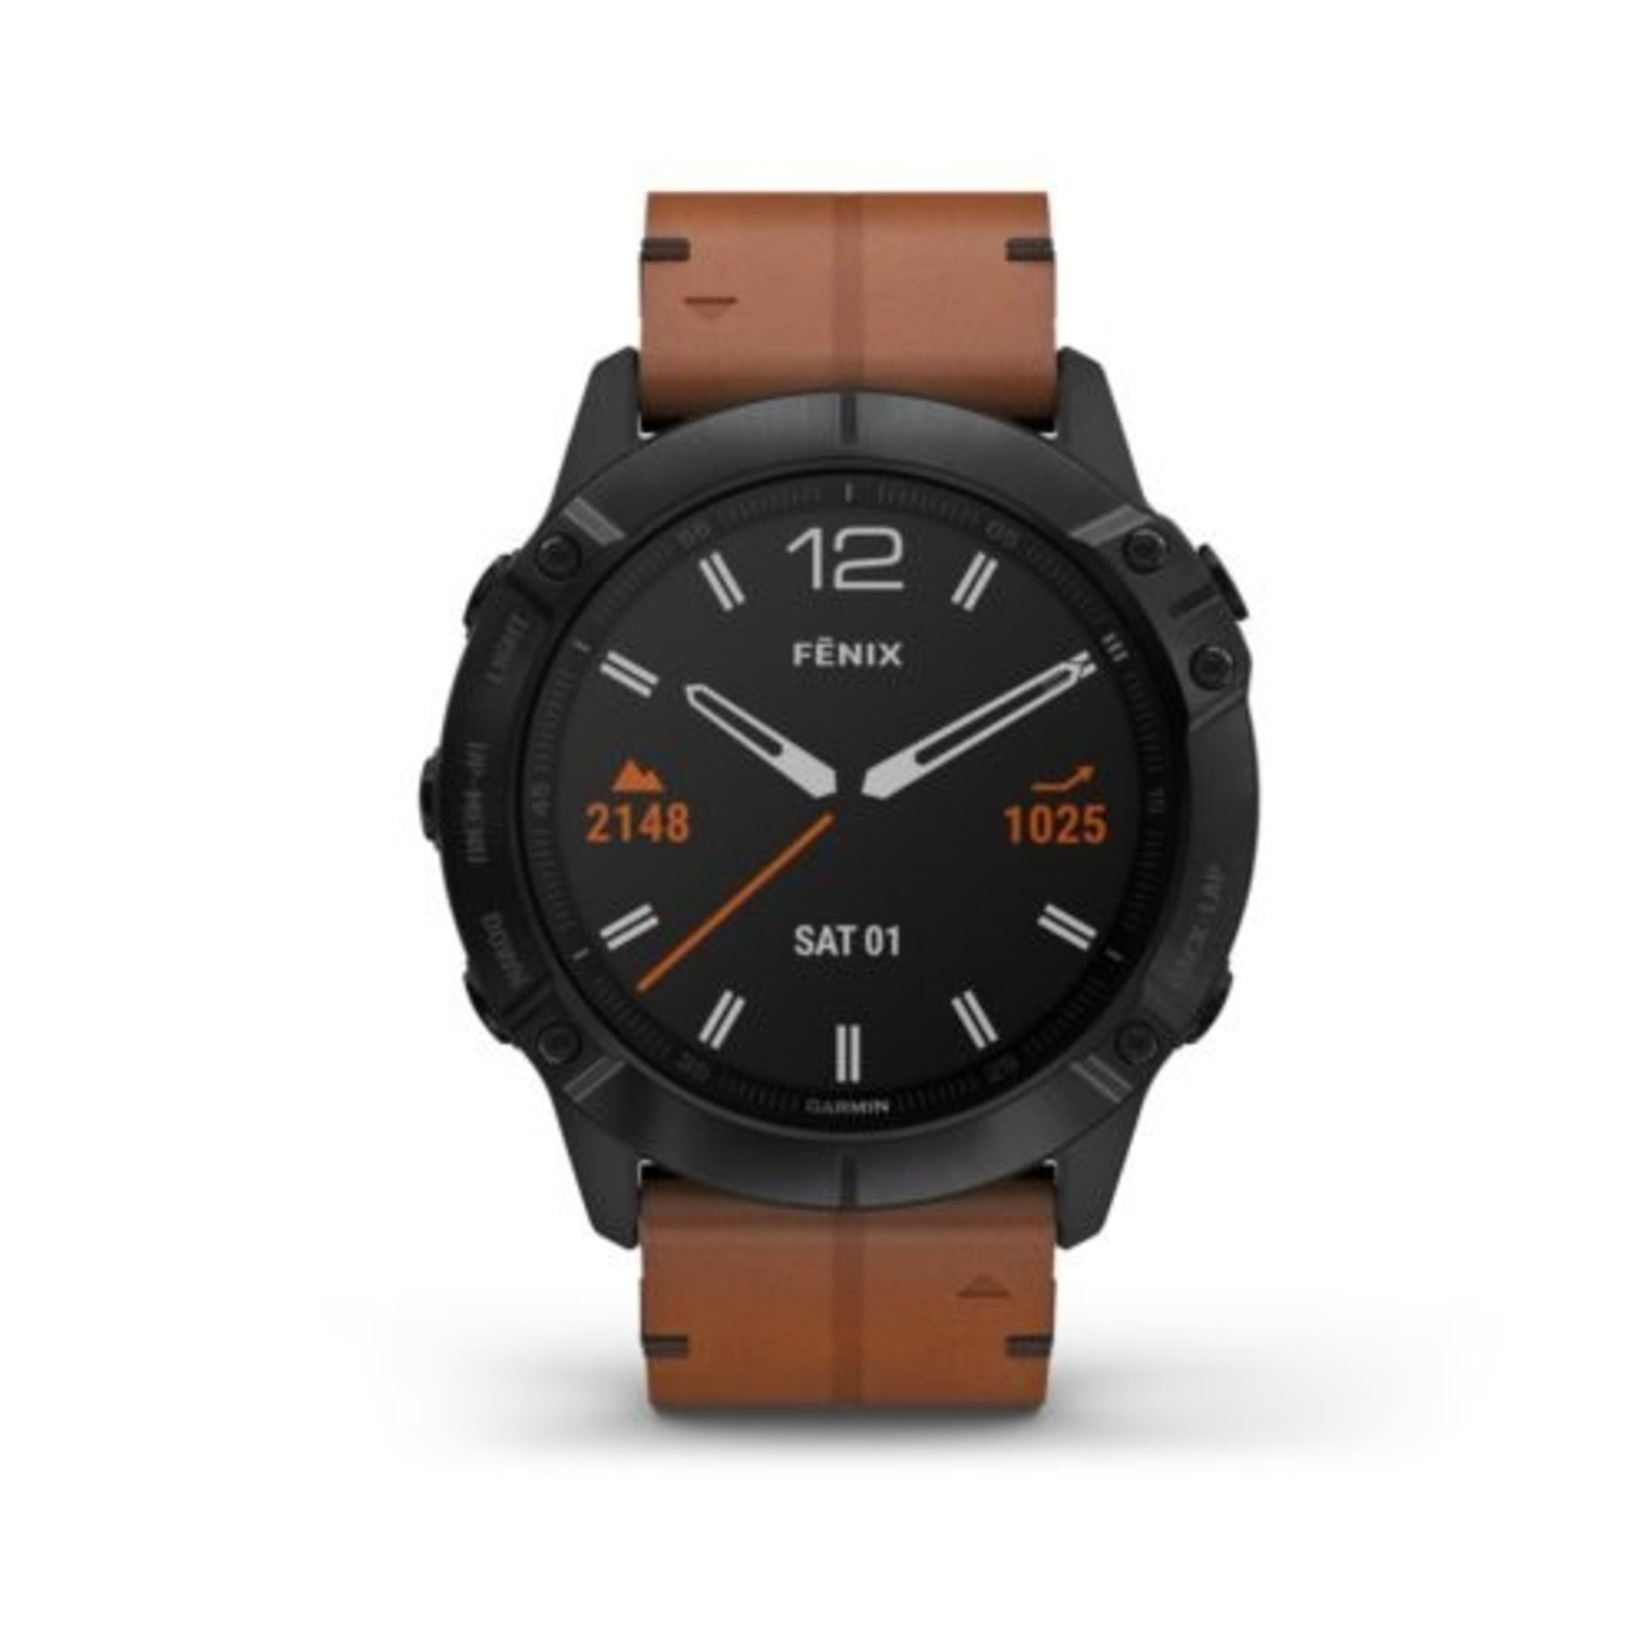 Garmin fēnix® 6X Sapphire - Black DLC with Chestnut Leather Band